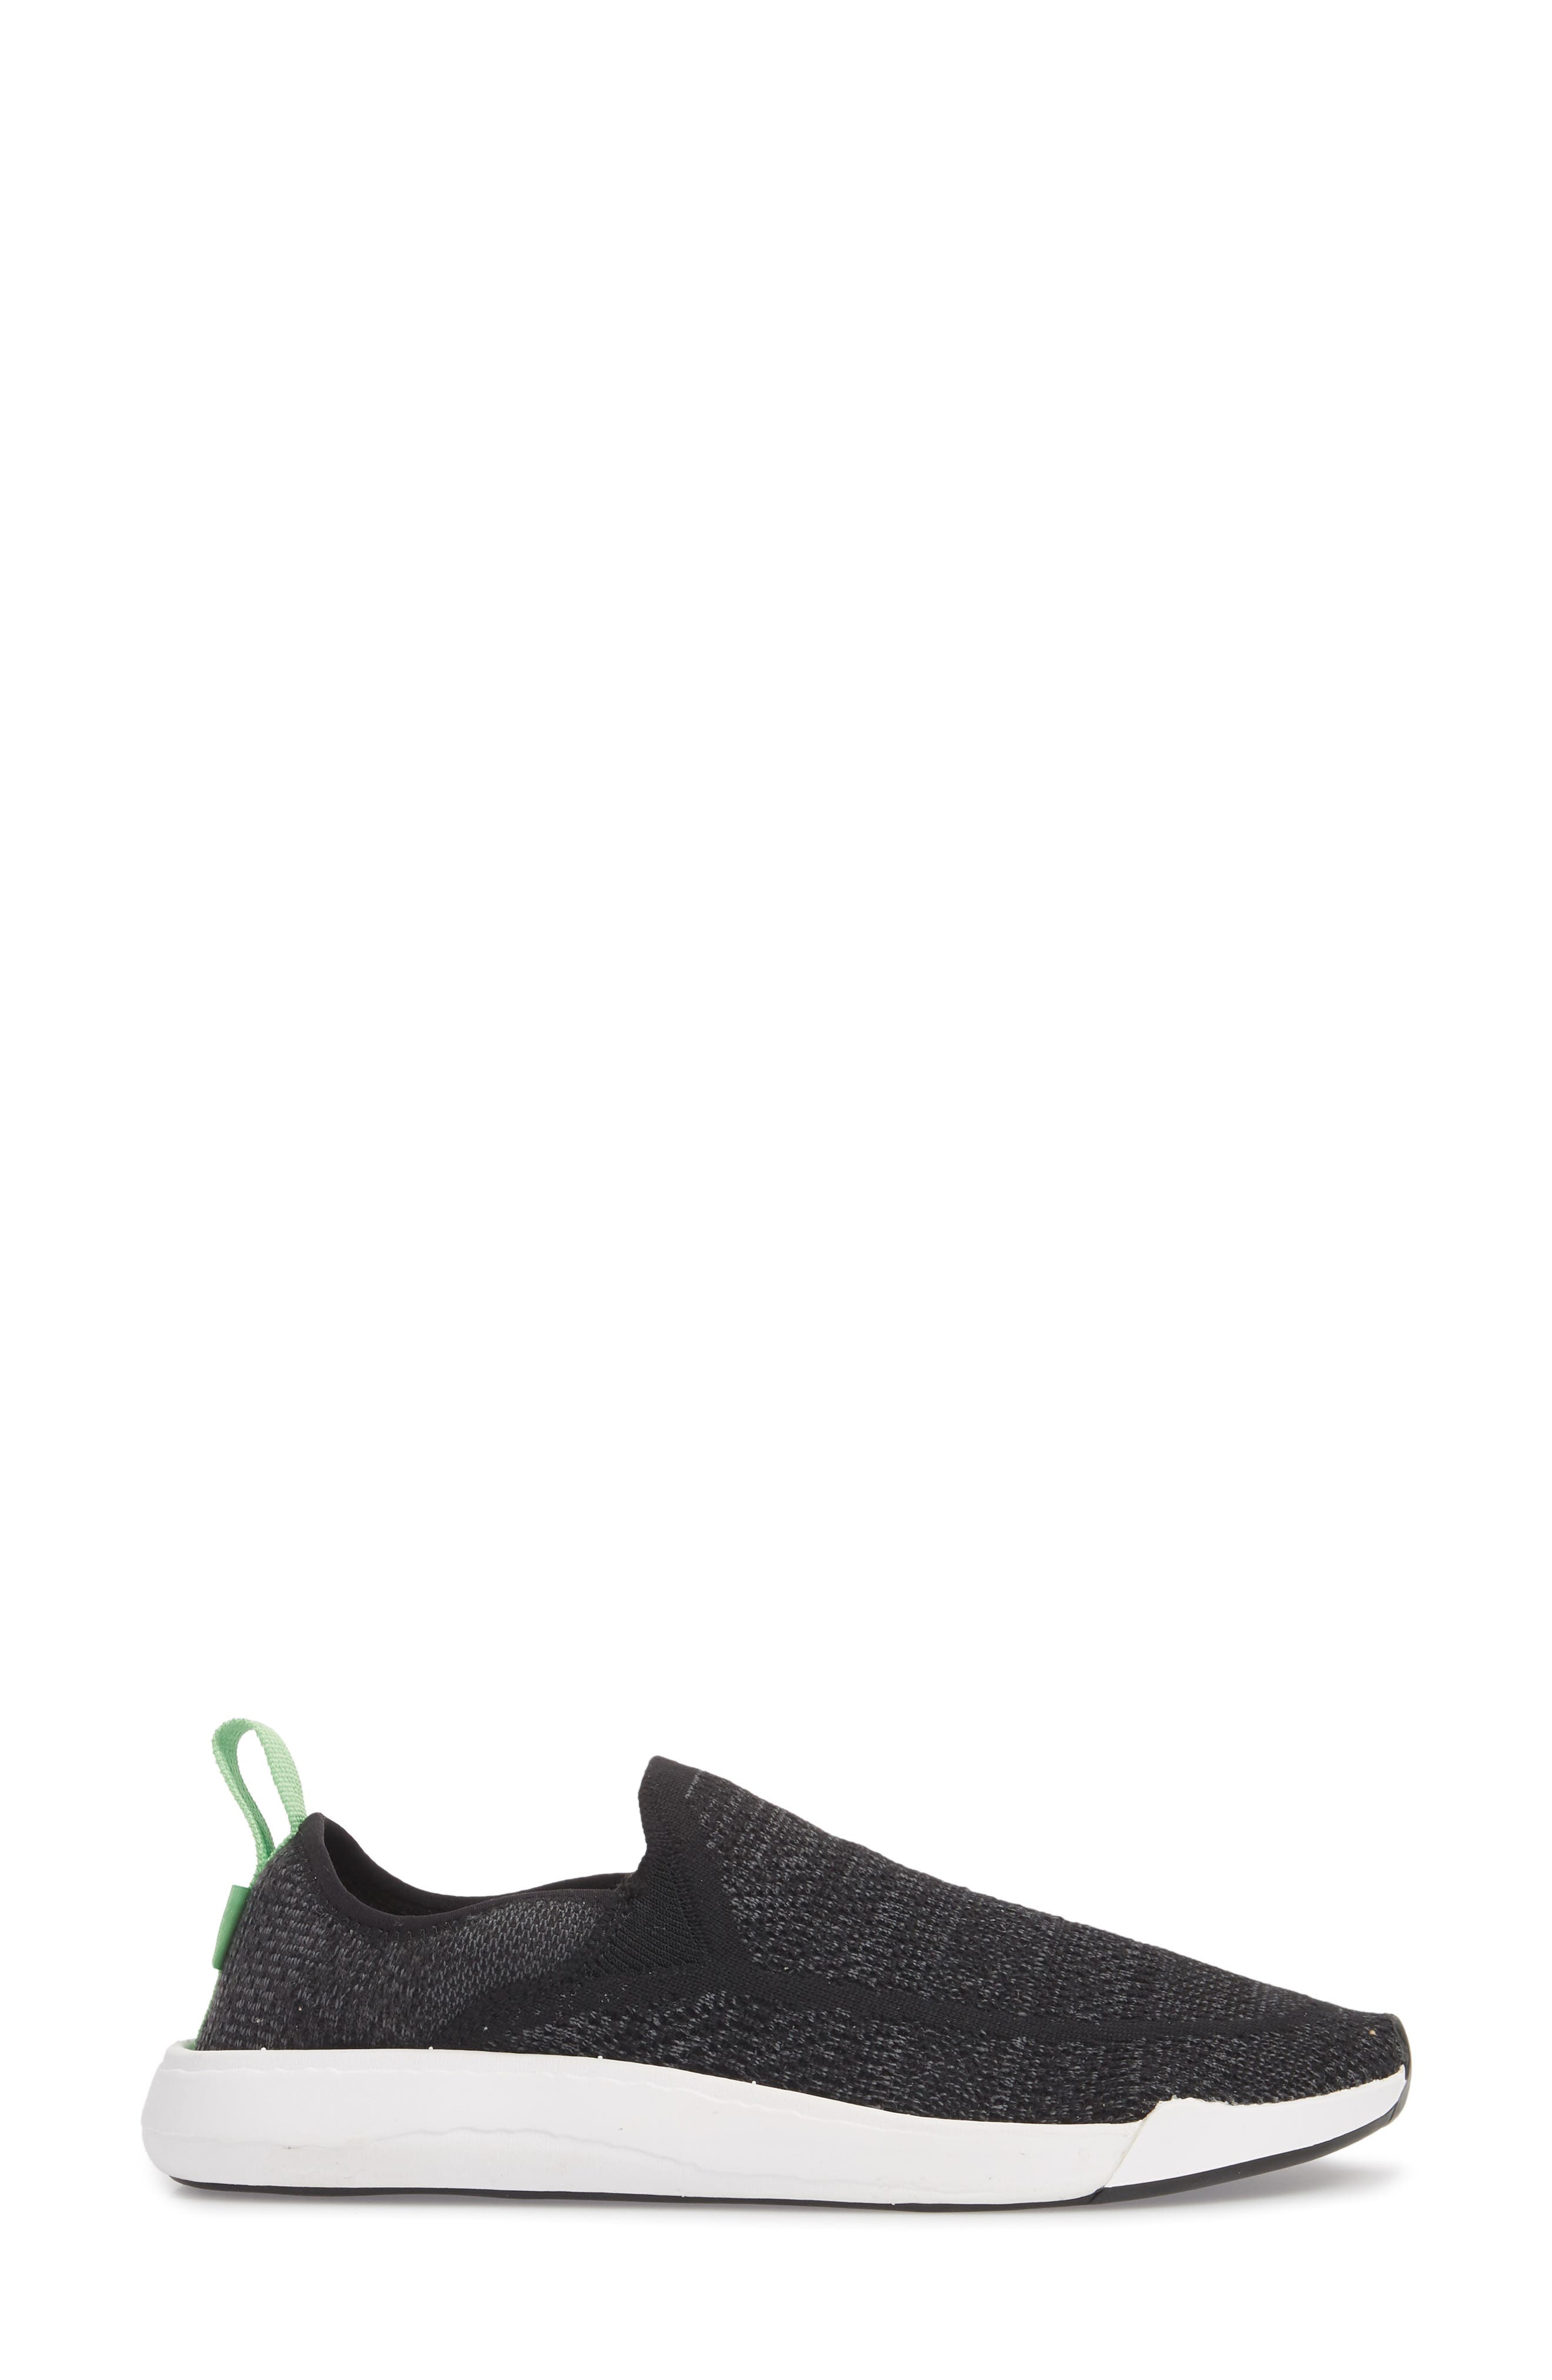 Chiba Quest Knit Slip-On Sneaker,                             Alternate thumbnail 3, color,                             Black